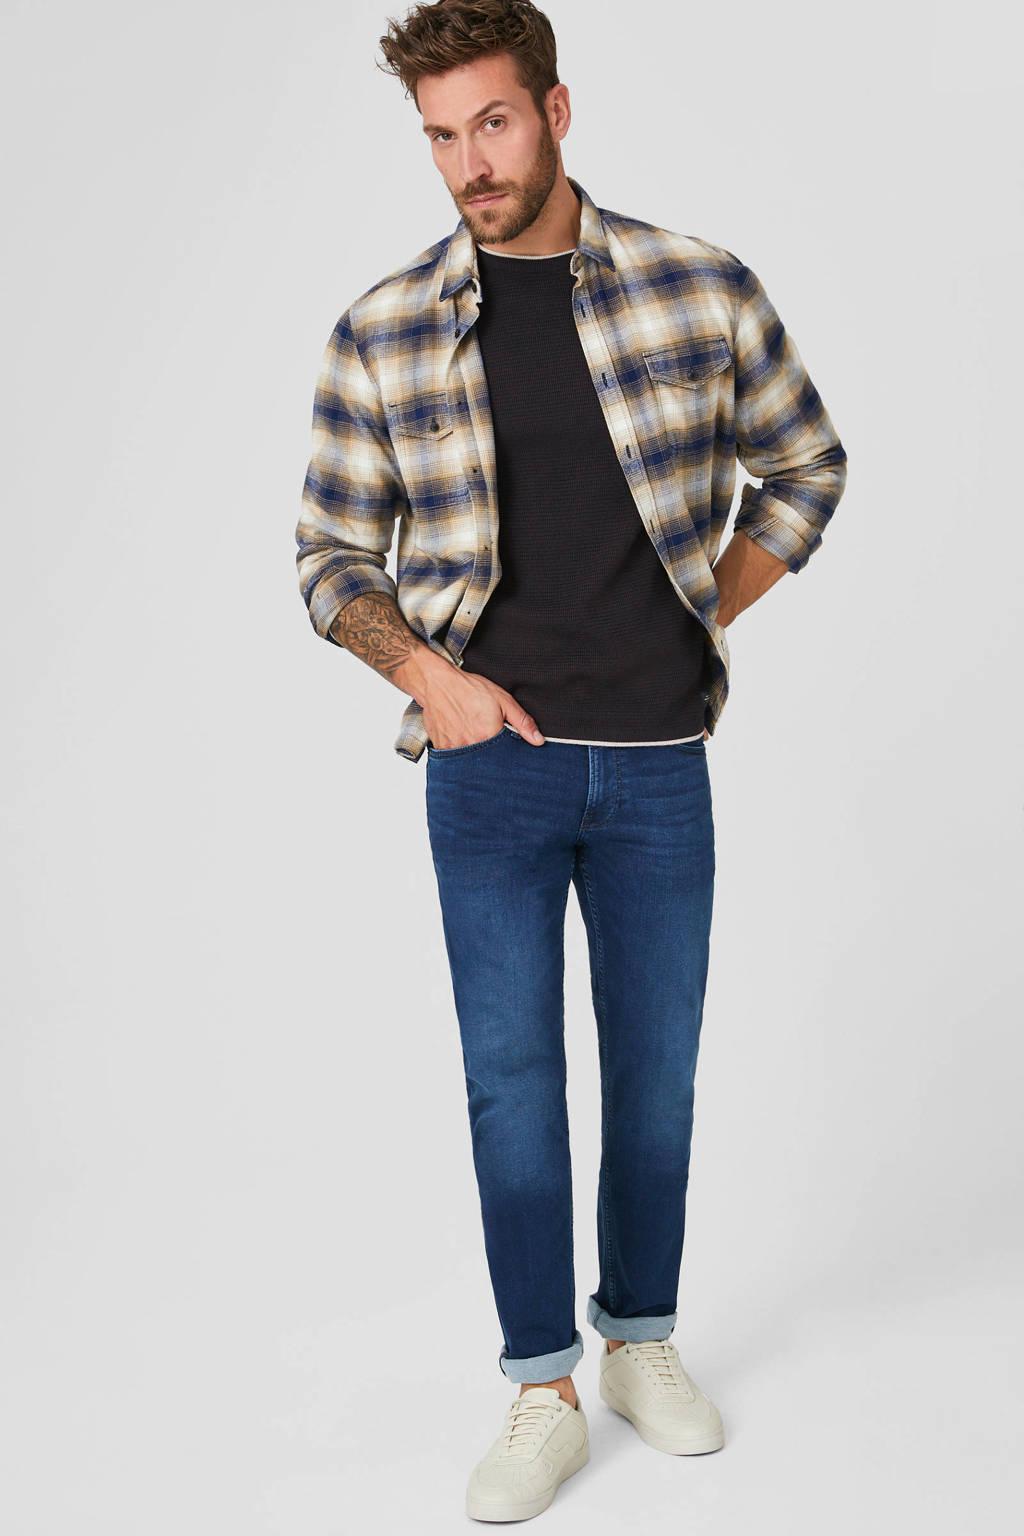 C&A Angelo Litrico trui donkerblauw, Donkerblauw